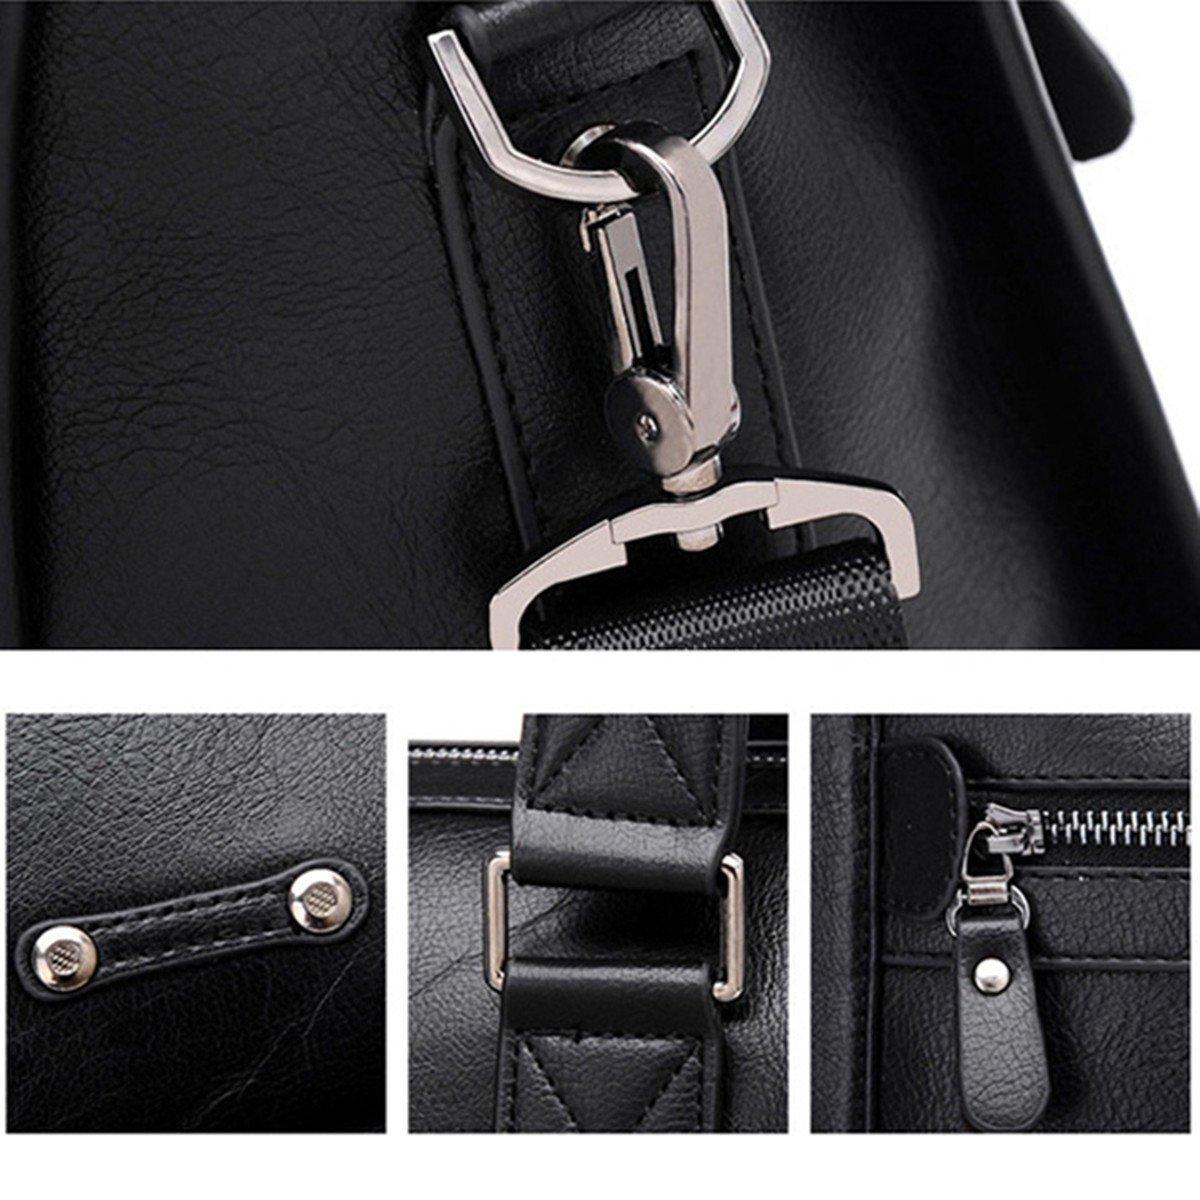 Amazon.com | gracosy Vintage Briefcase, Leather Business Bag Mens Large Working Bag Laptop Bag Teacher Bag for Travel Office Black-Medium 15.4 11.8 ...